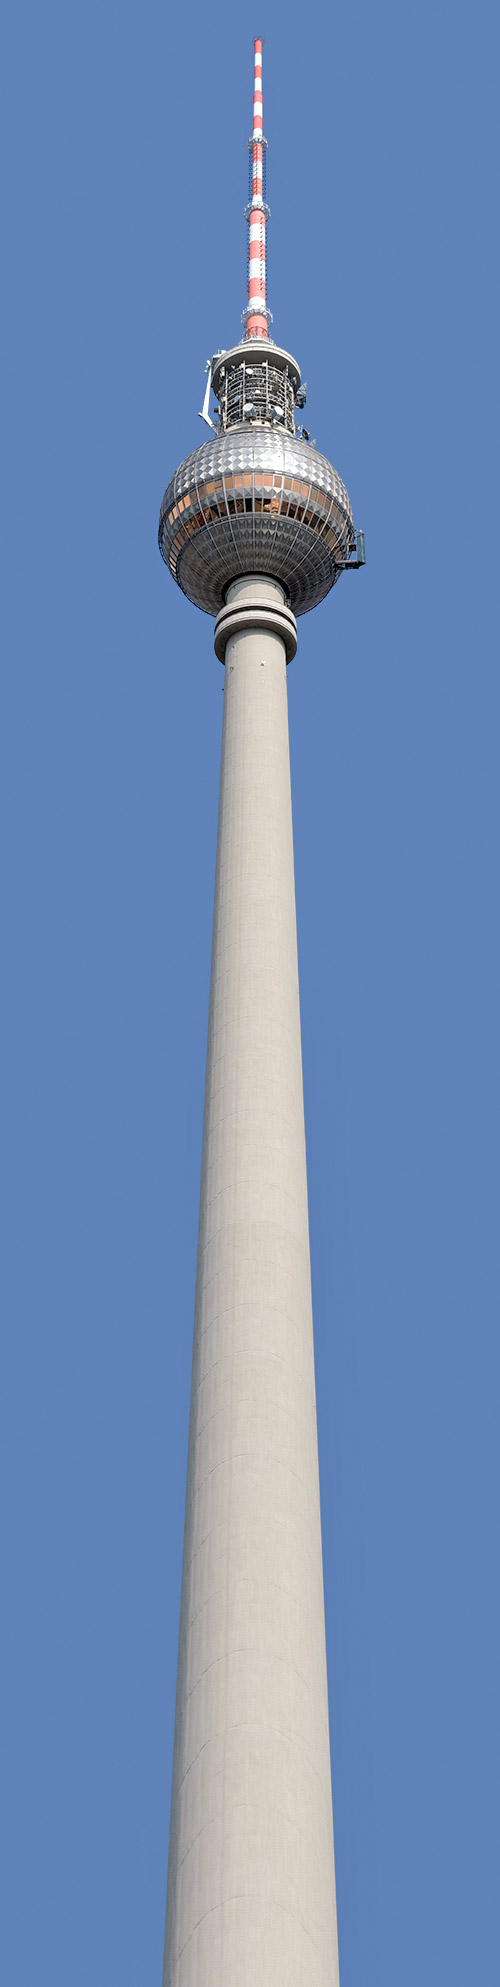 Fernsehturm 1